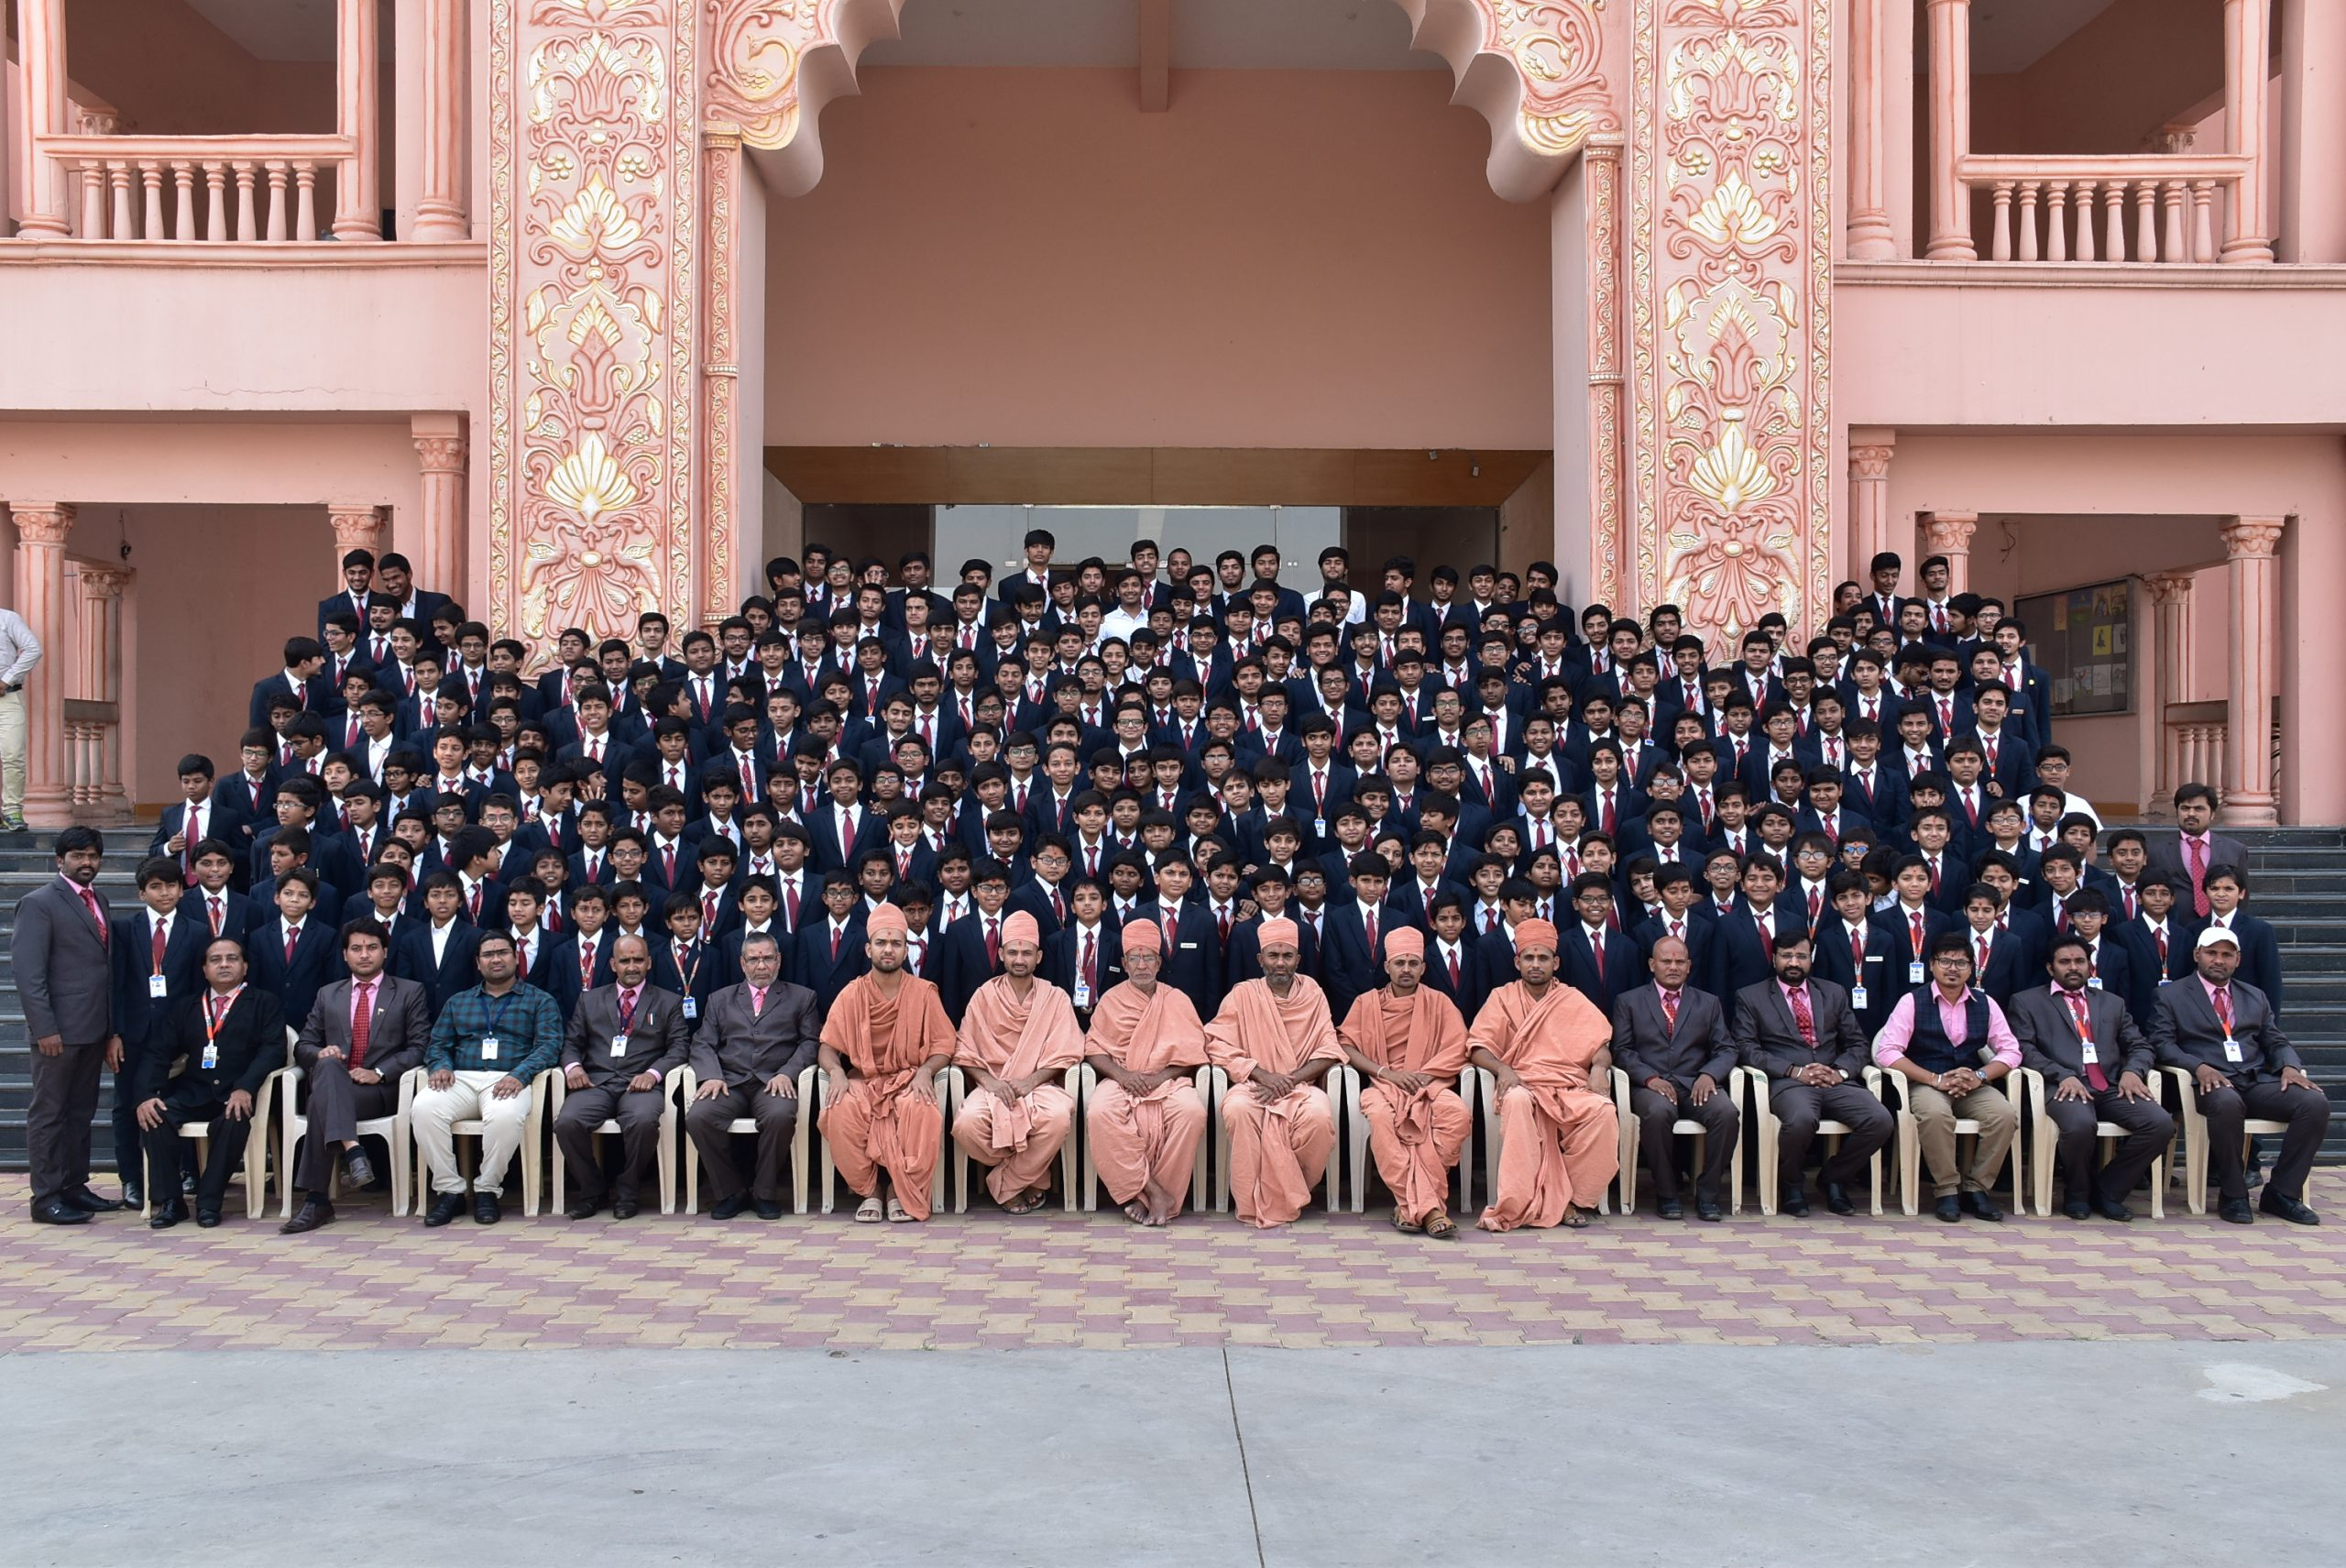 SHREE NEELAKANTH VIDYAPEETH Students Teachers and Saints Group Photo